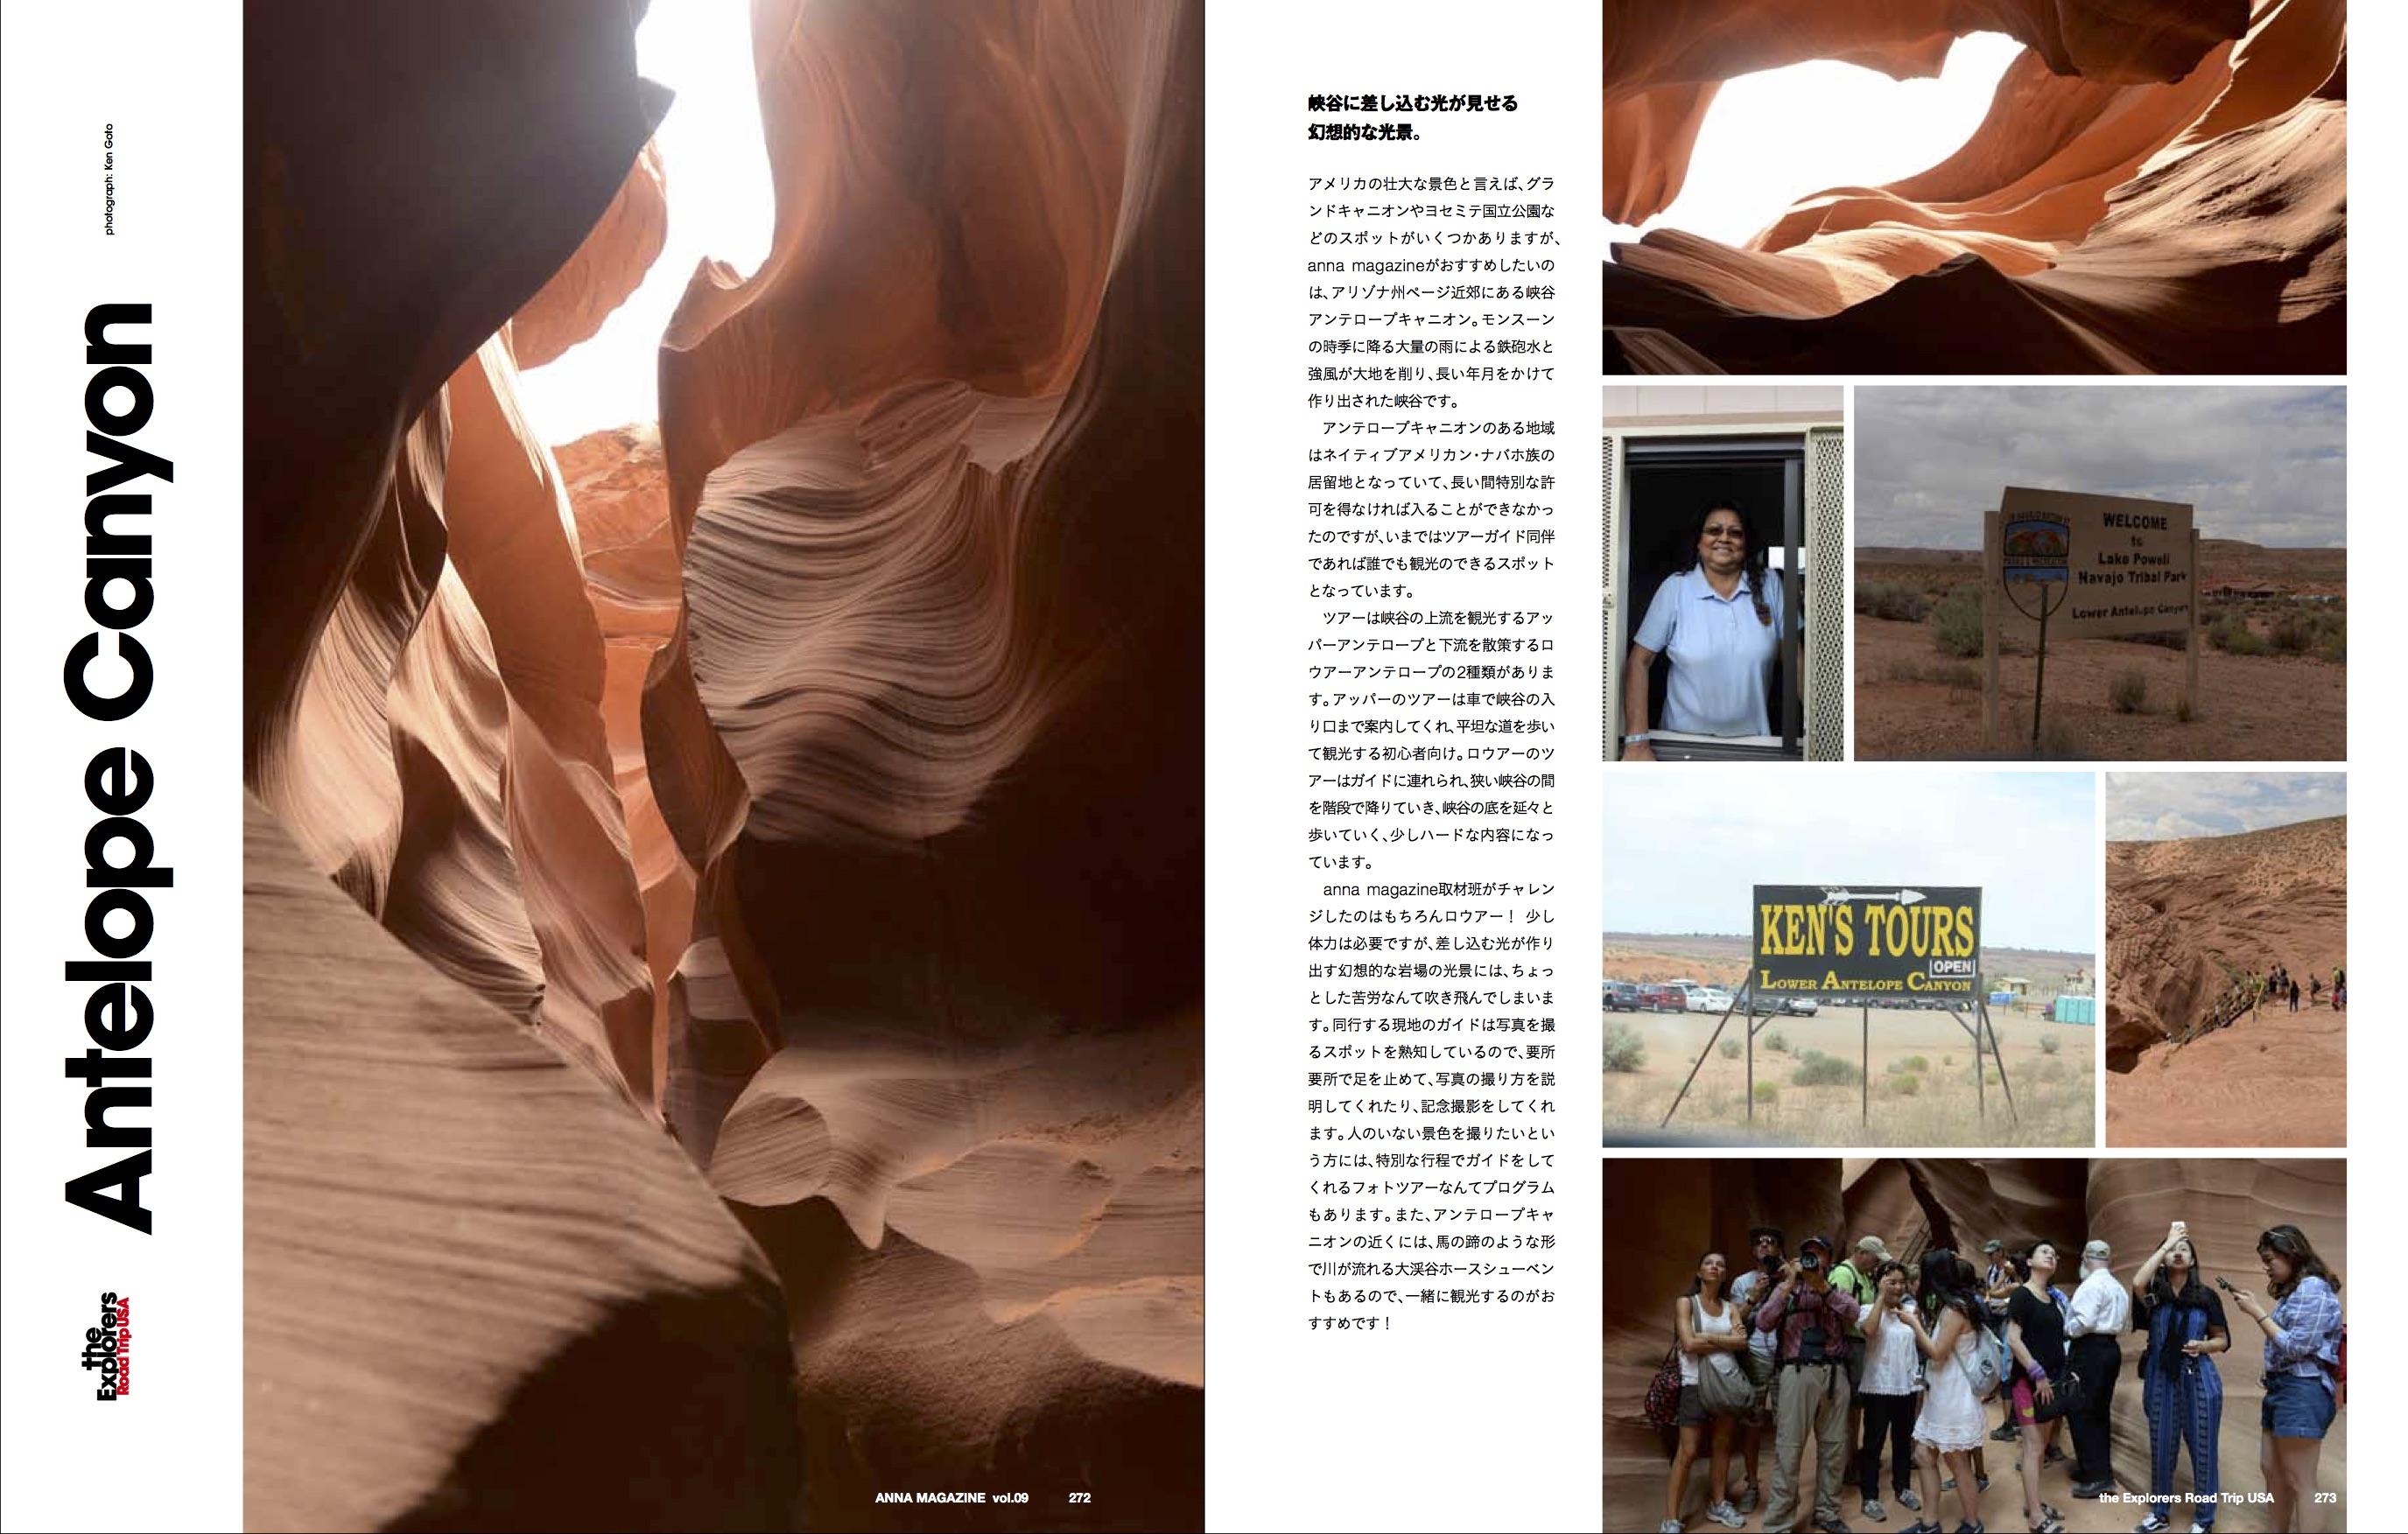 anna magazine vol.9 P129